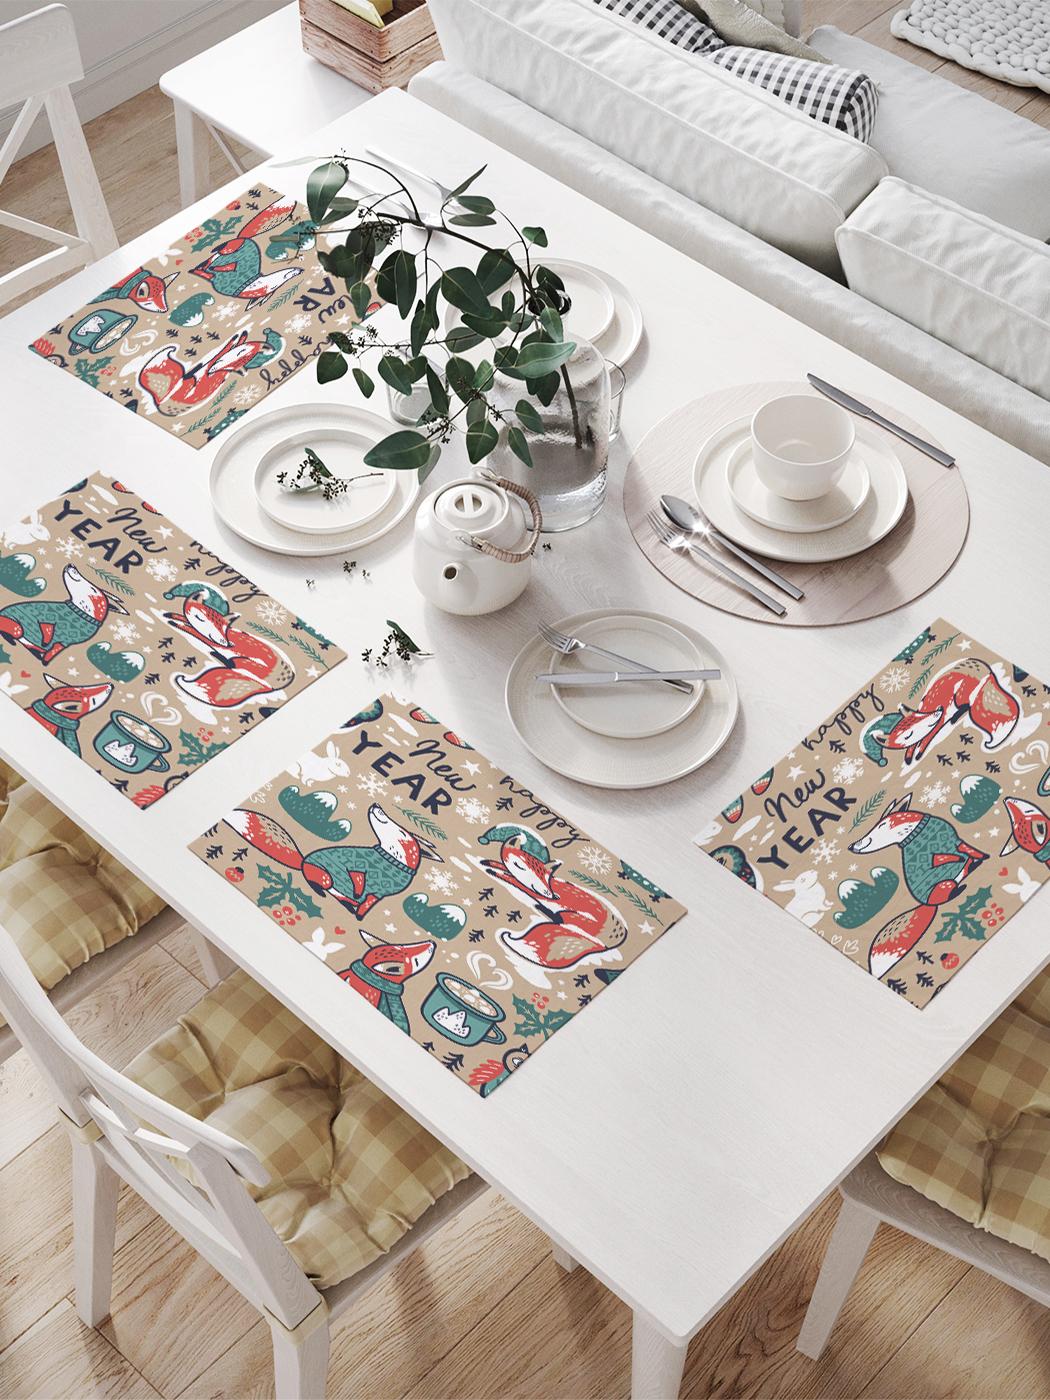 Комплект салфеток для сервировки стола «Лиса Алиса» (32х46 см, 4 шт.)